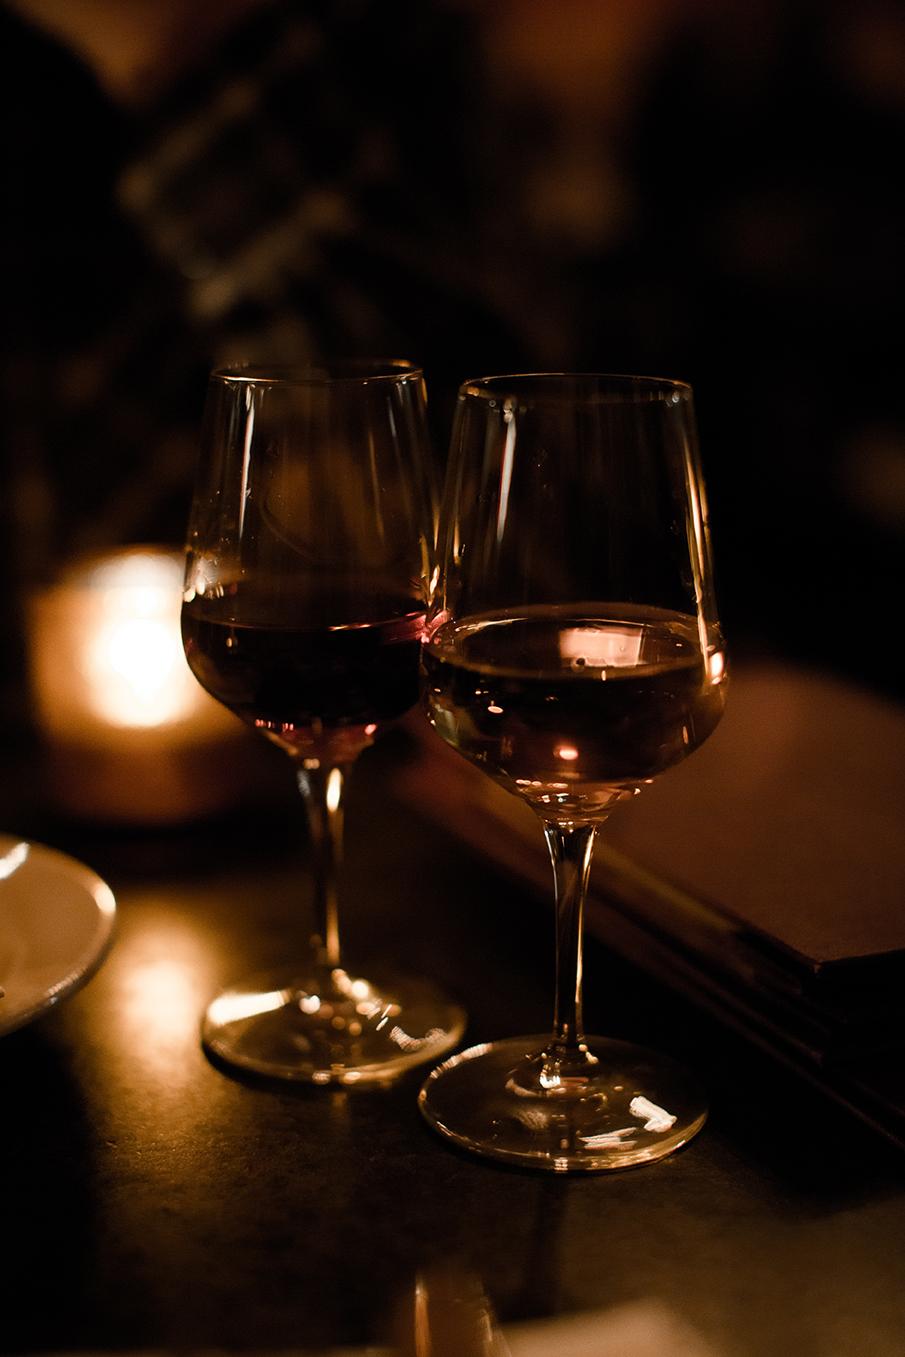 Cider/Food - A blog by Cidermaker Ryan Burk and Photographer Eva Deitch